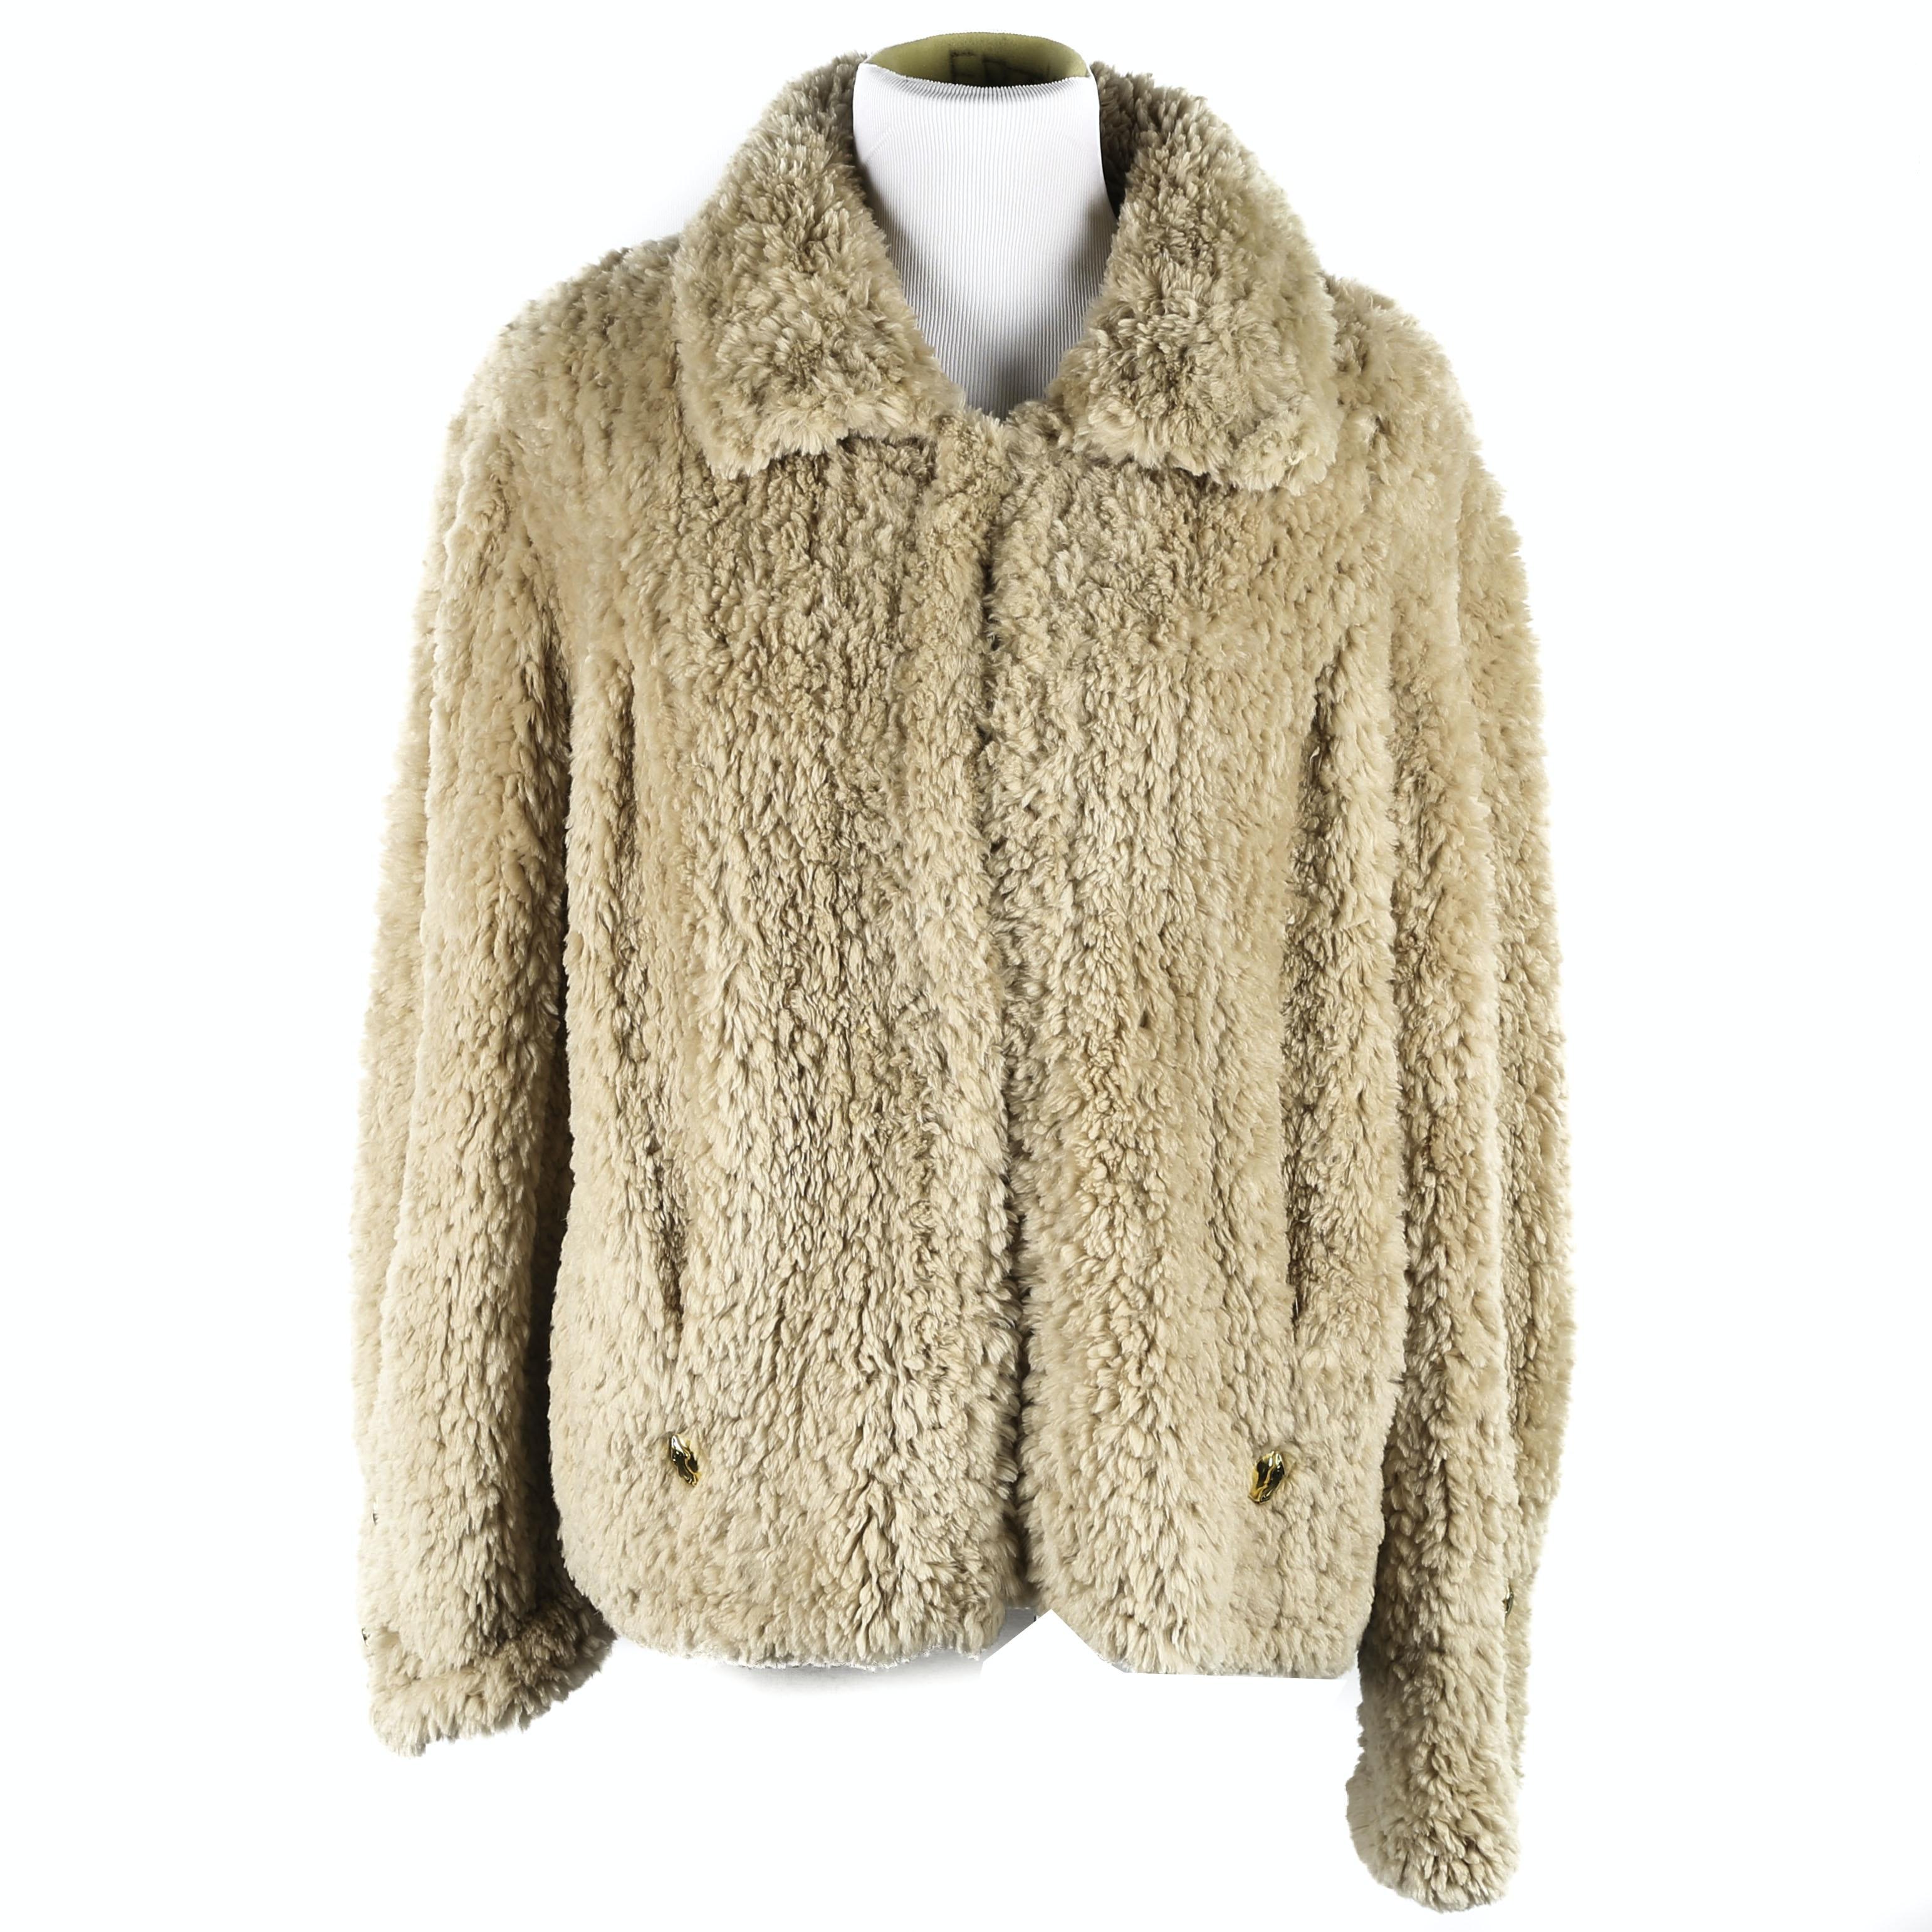 Vintage Handmade Sheared Beaver Fur Jacket from Paula Lishman